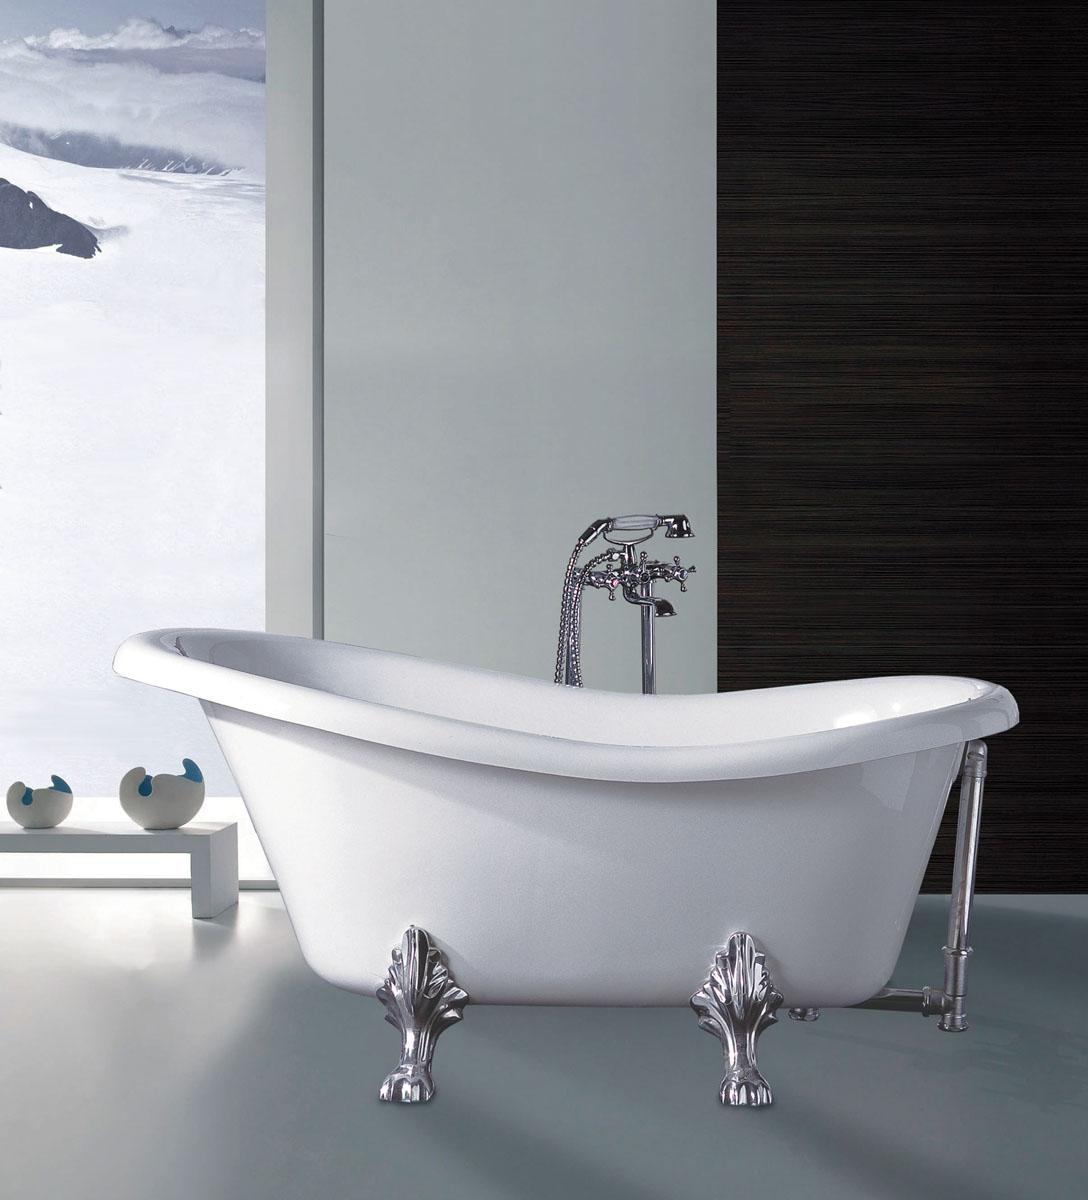 arckstone vasca arredo acrilico epoca stile antico classico bianco